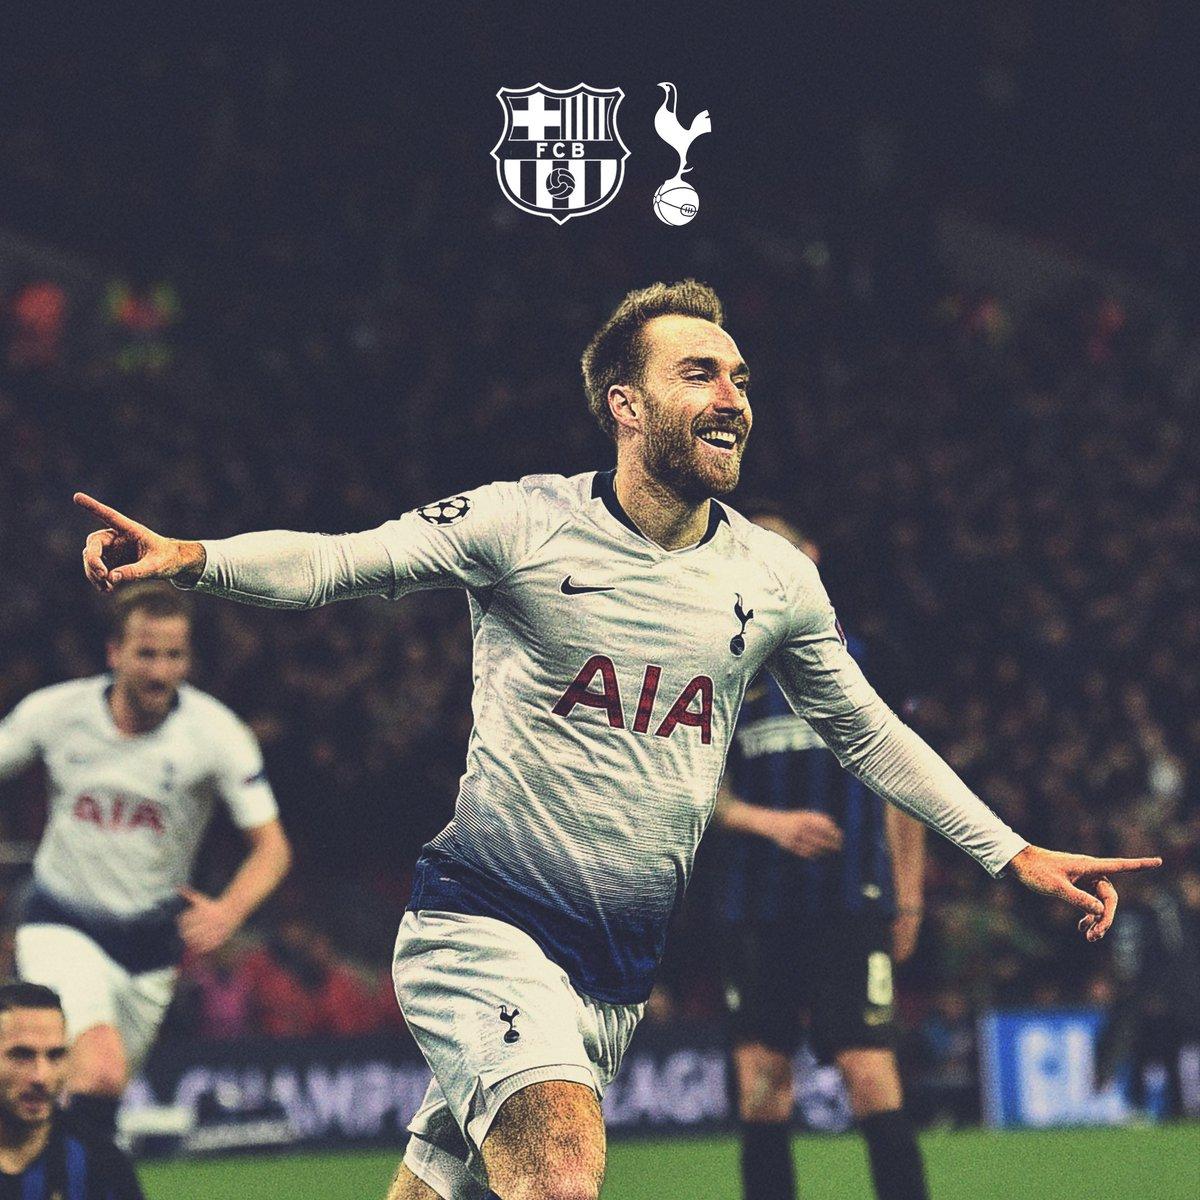 🇪🇸 MATCHDAY ⚽️  🆚 @FCBarcelona  🏟️ Camp Nou  🏆 @ChampionsLeague  ⏱️ 8pm (UK)   #COYS